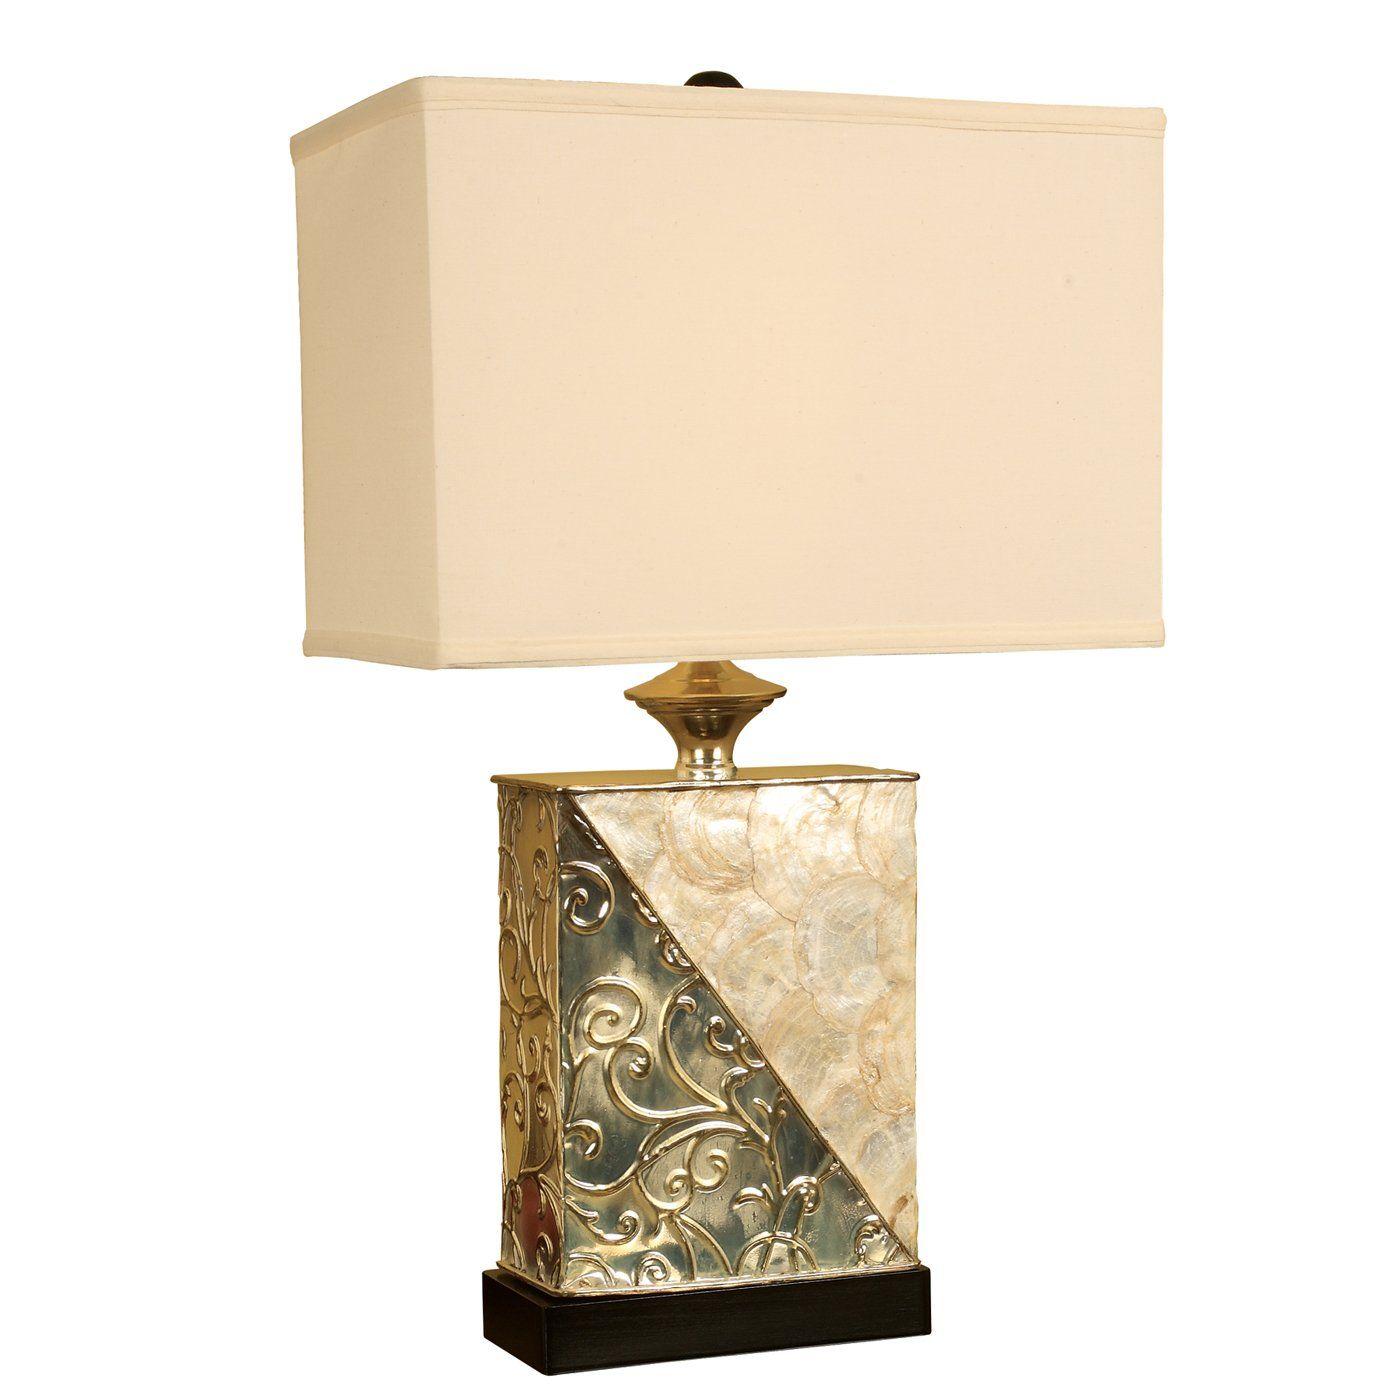 Mario Lamps 10t909 Rectangle Capiz Shell Table Lamp Lamp Table Lamp Novelty Lamp